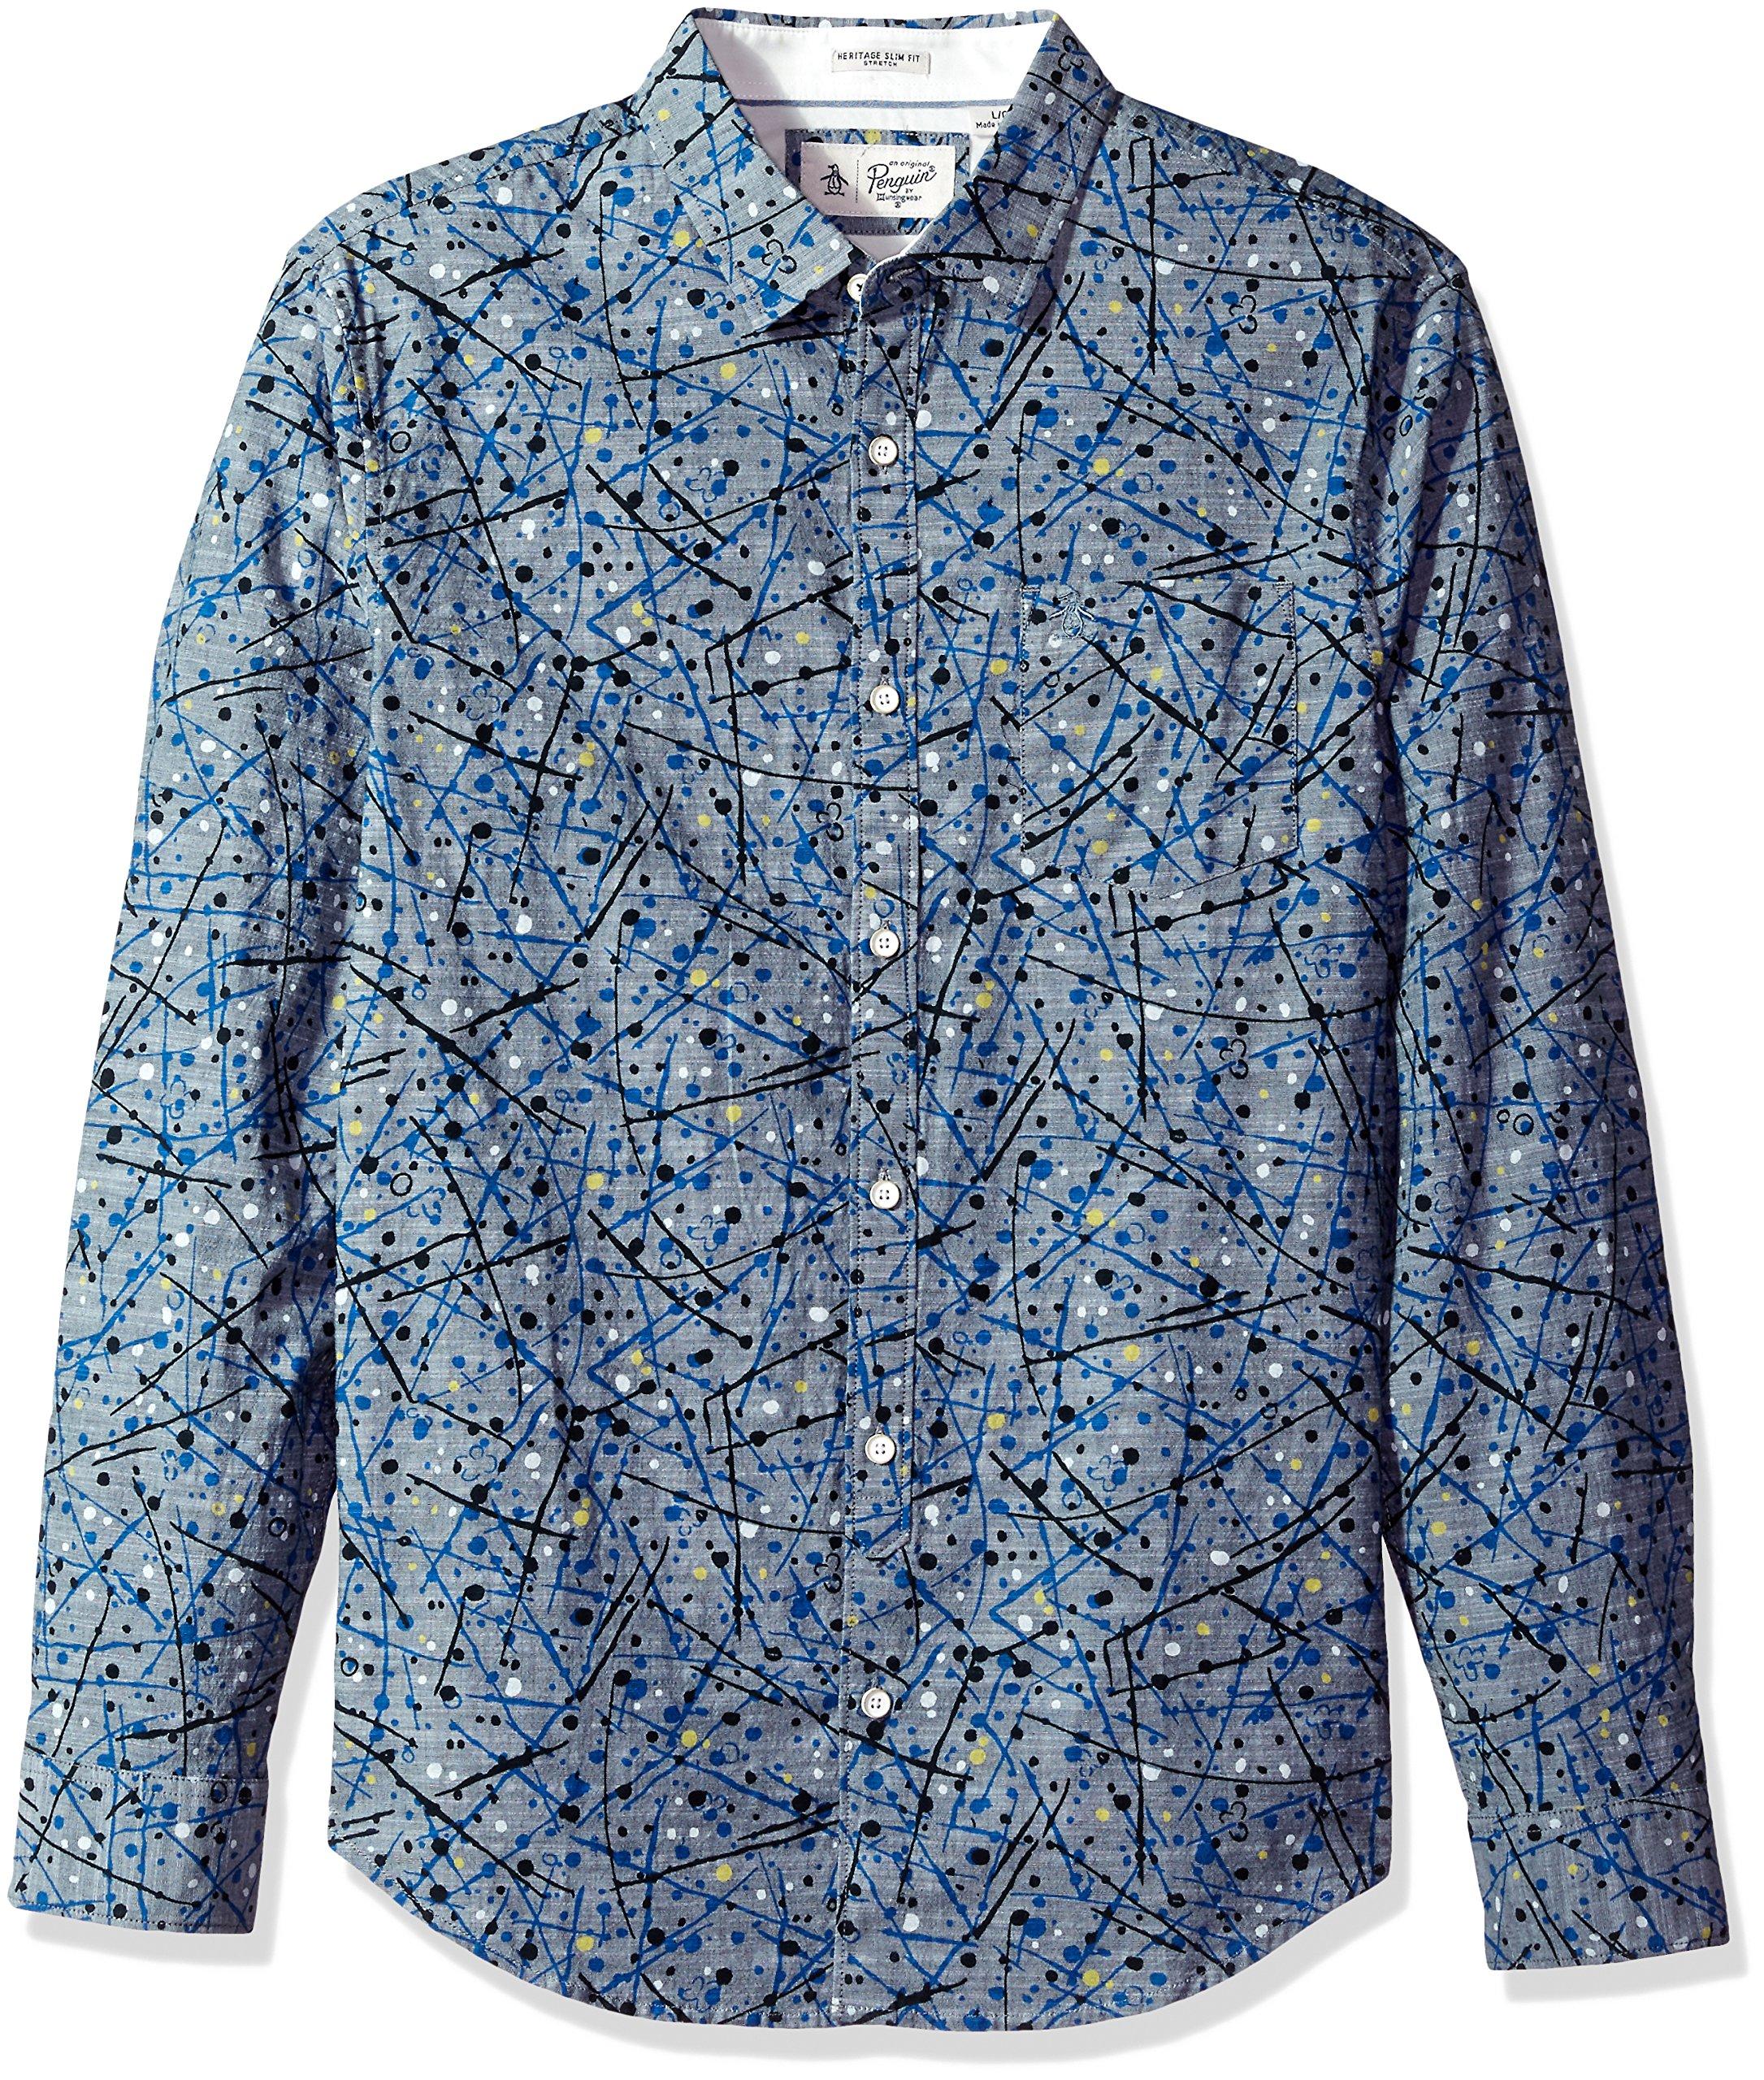 Original Penguin Men's Splatter Print Dress Shirt, Snorkel Blue, Extra Large